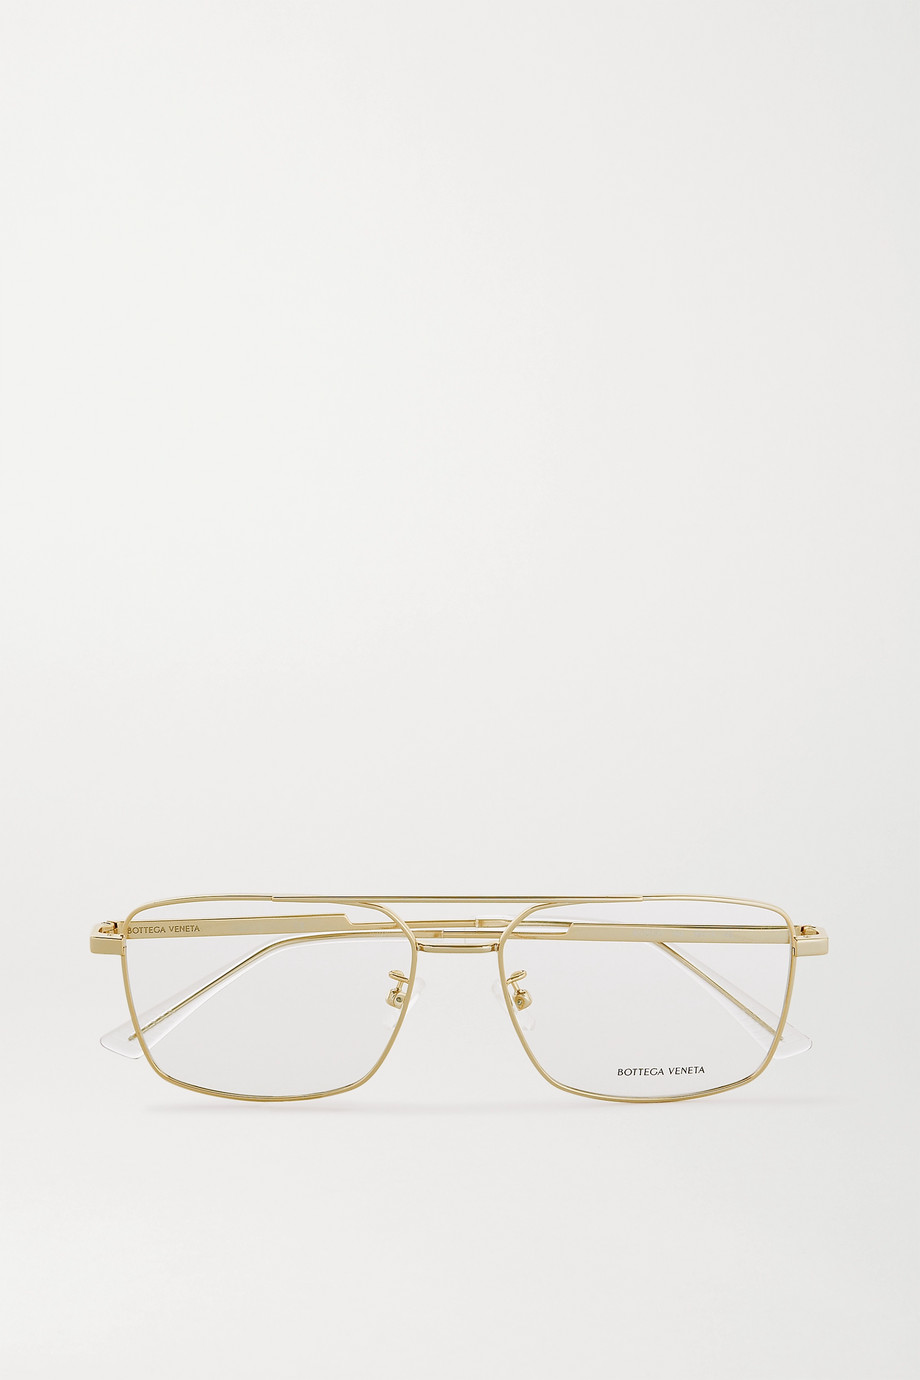 Bottega Veneta Aviator-style gold-tone optical glasses